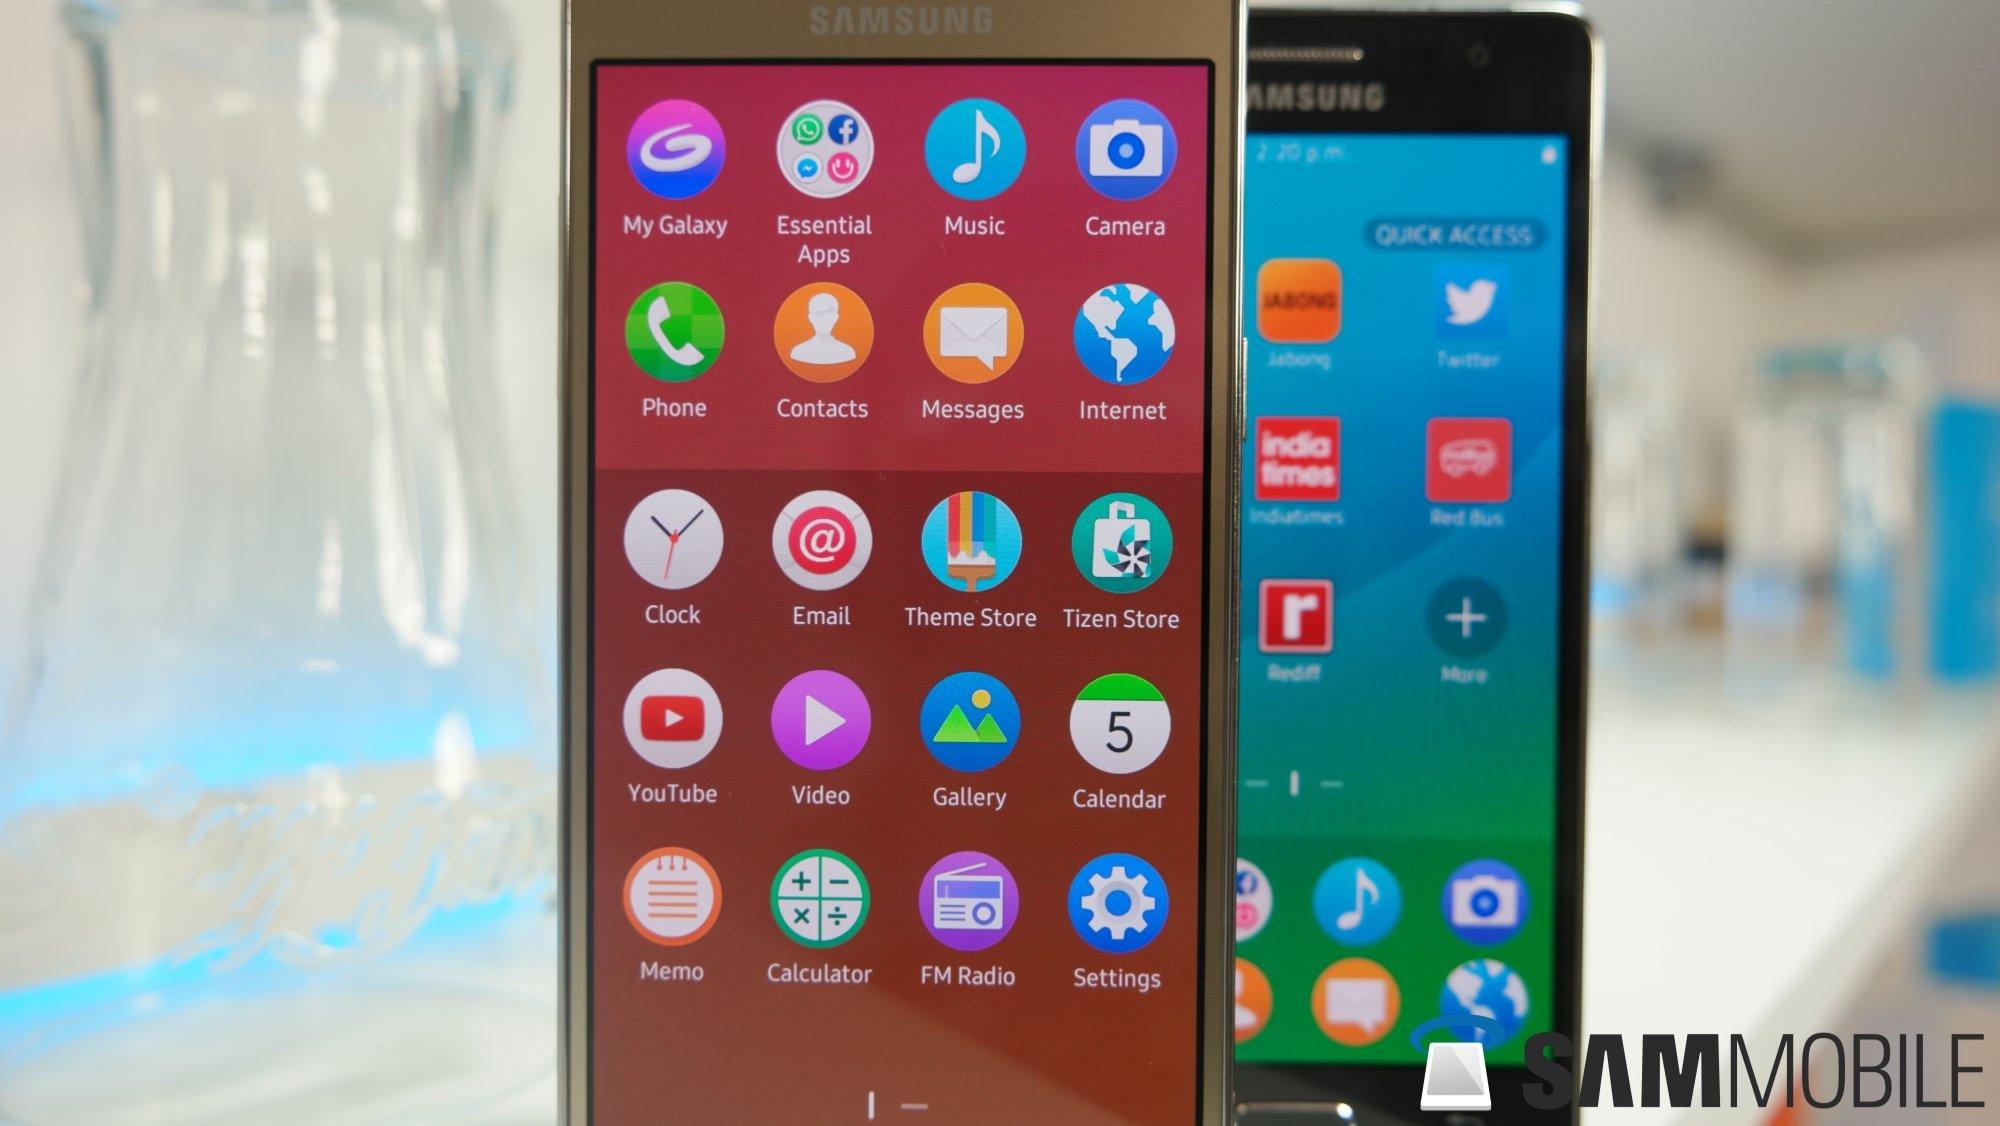 Samsung Z3 Review: Tizen's app problem makes this a poor